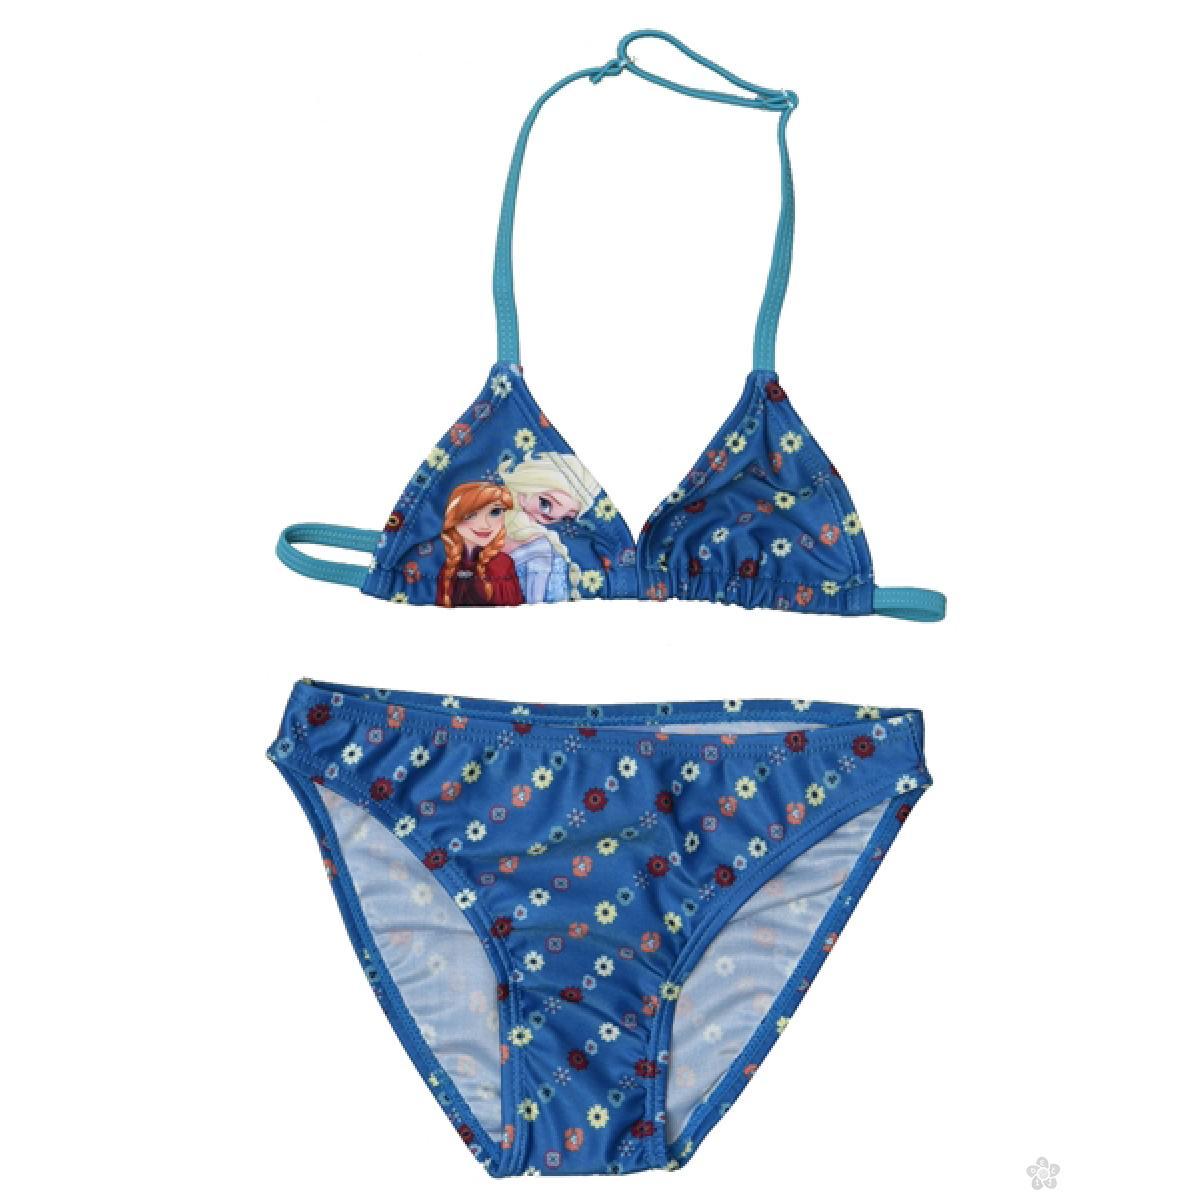 Dvodelni kupaći za devojčice - bikini Frozen, D94229